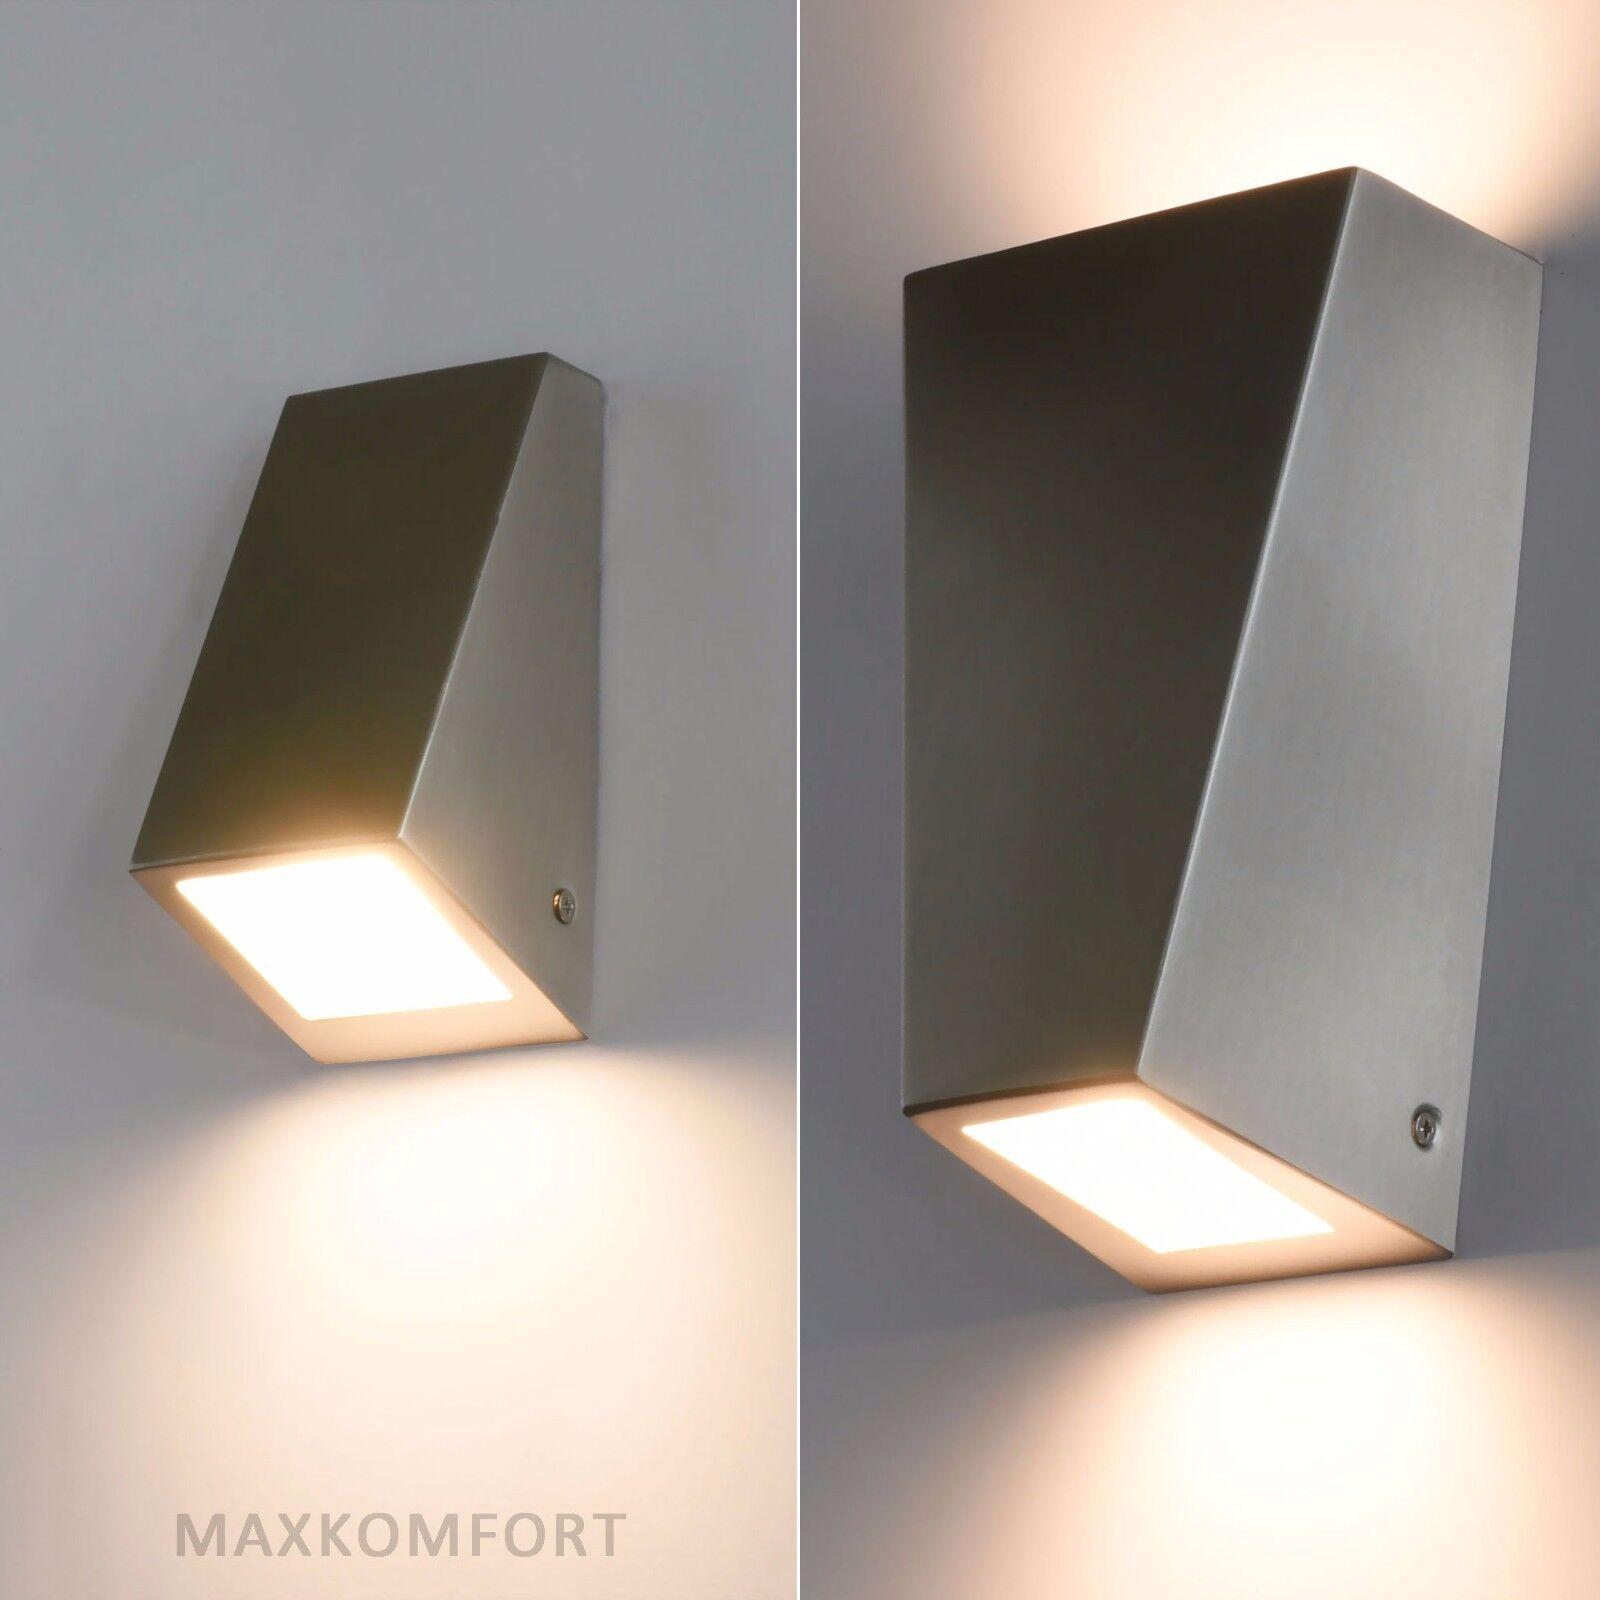 aussenleuchten edelstahl up down led test vergleich aussenleuchten edelstahl up down led. Black Bedroom Furniture Sets. Home Design Ideas